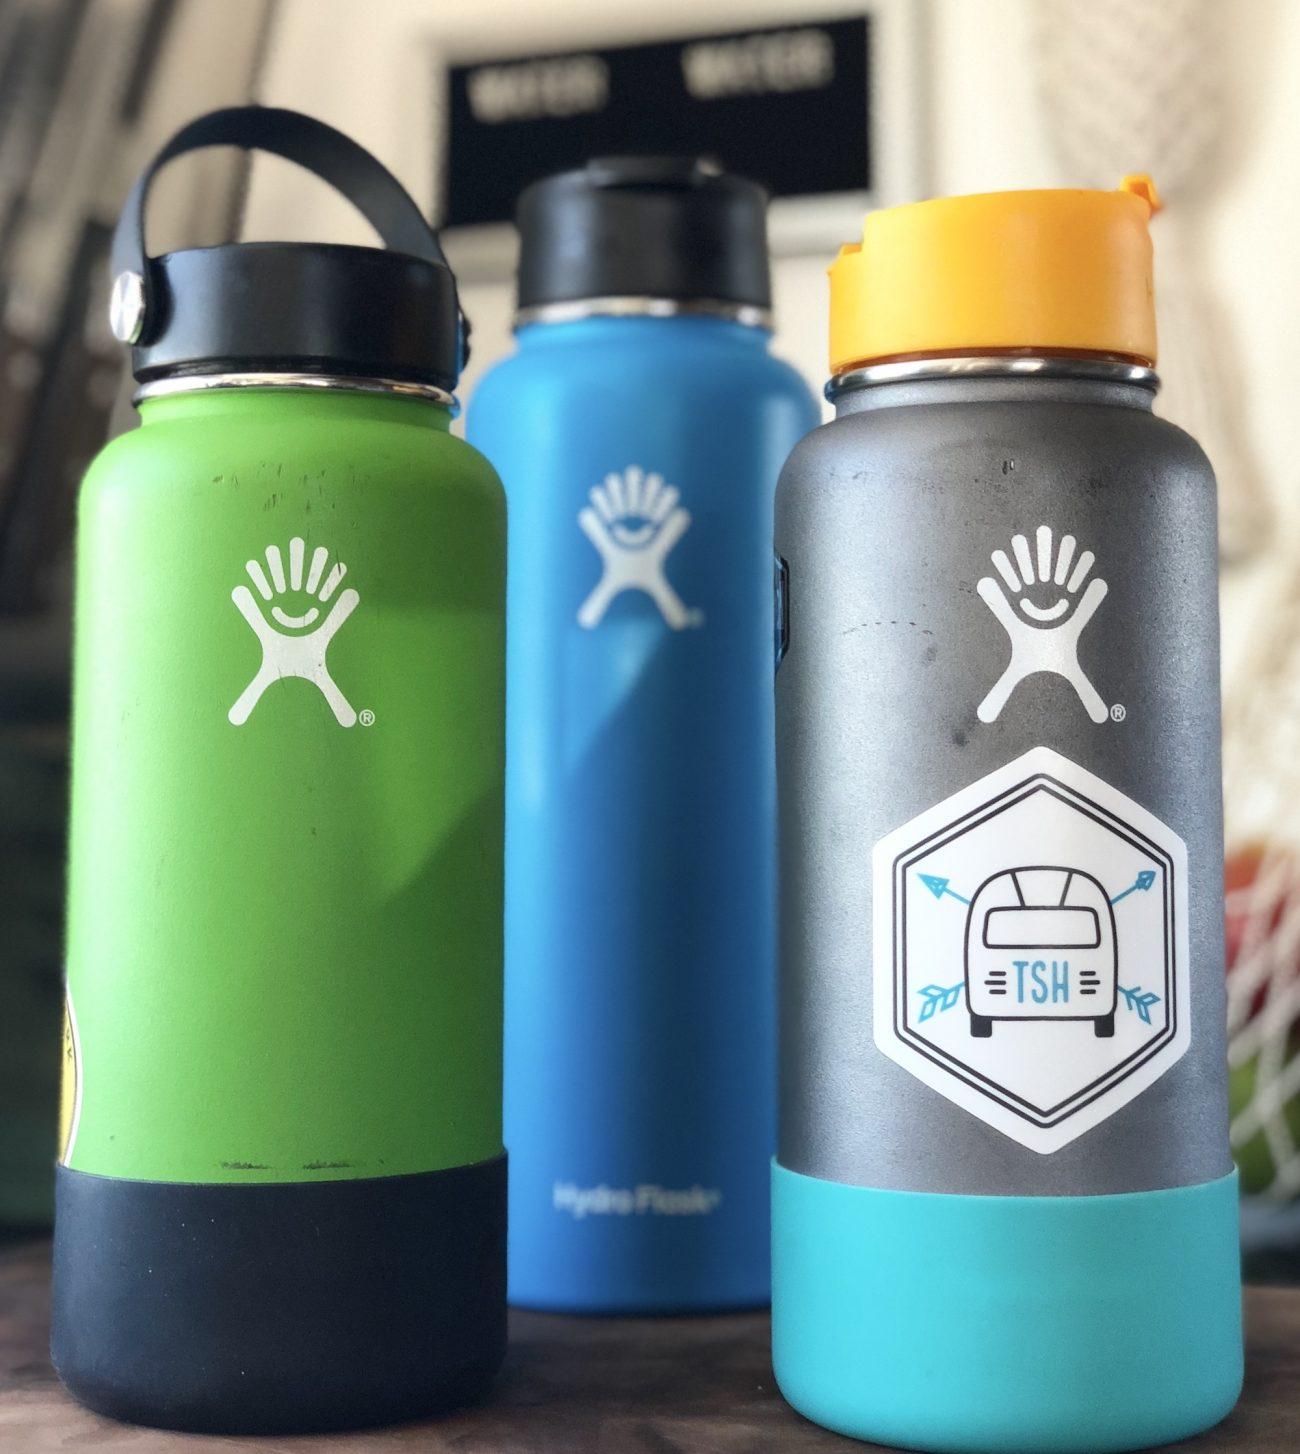 hydroflask bottles